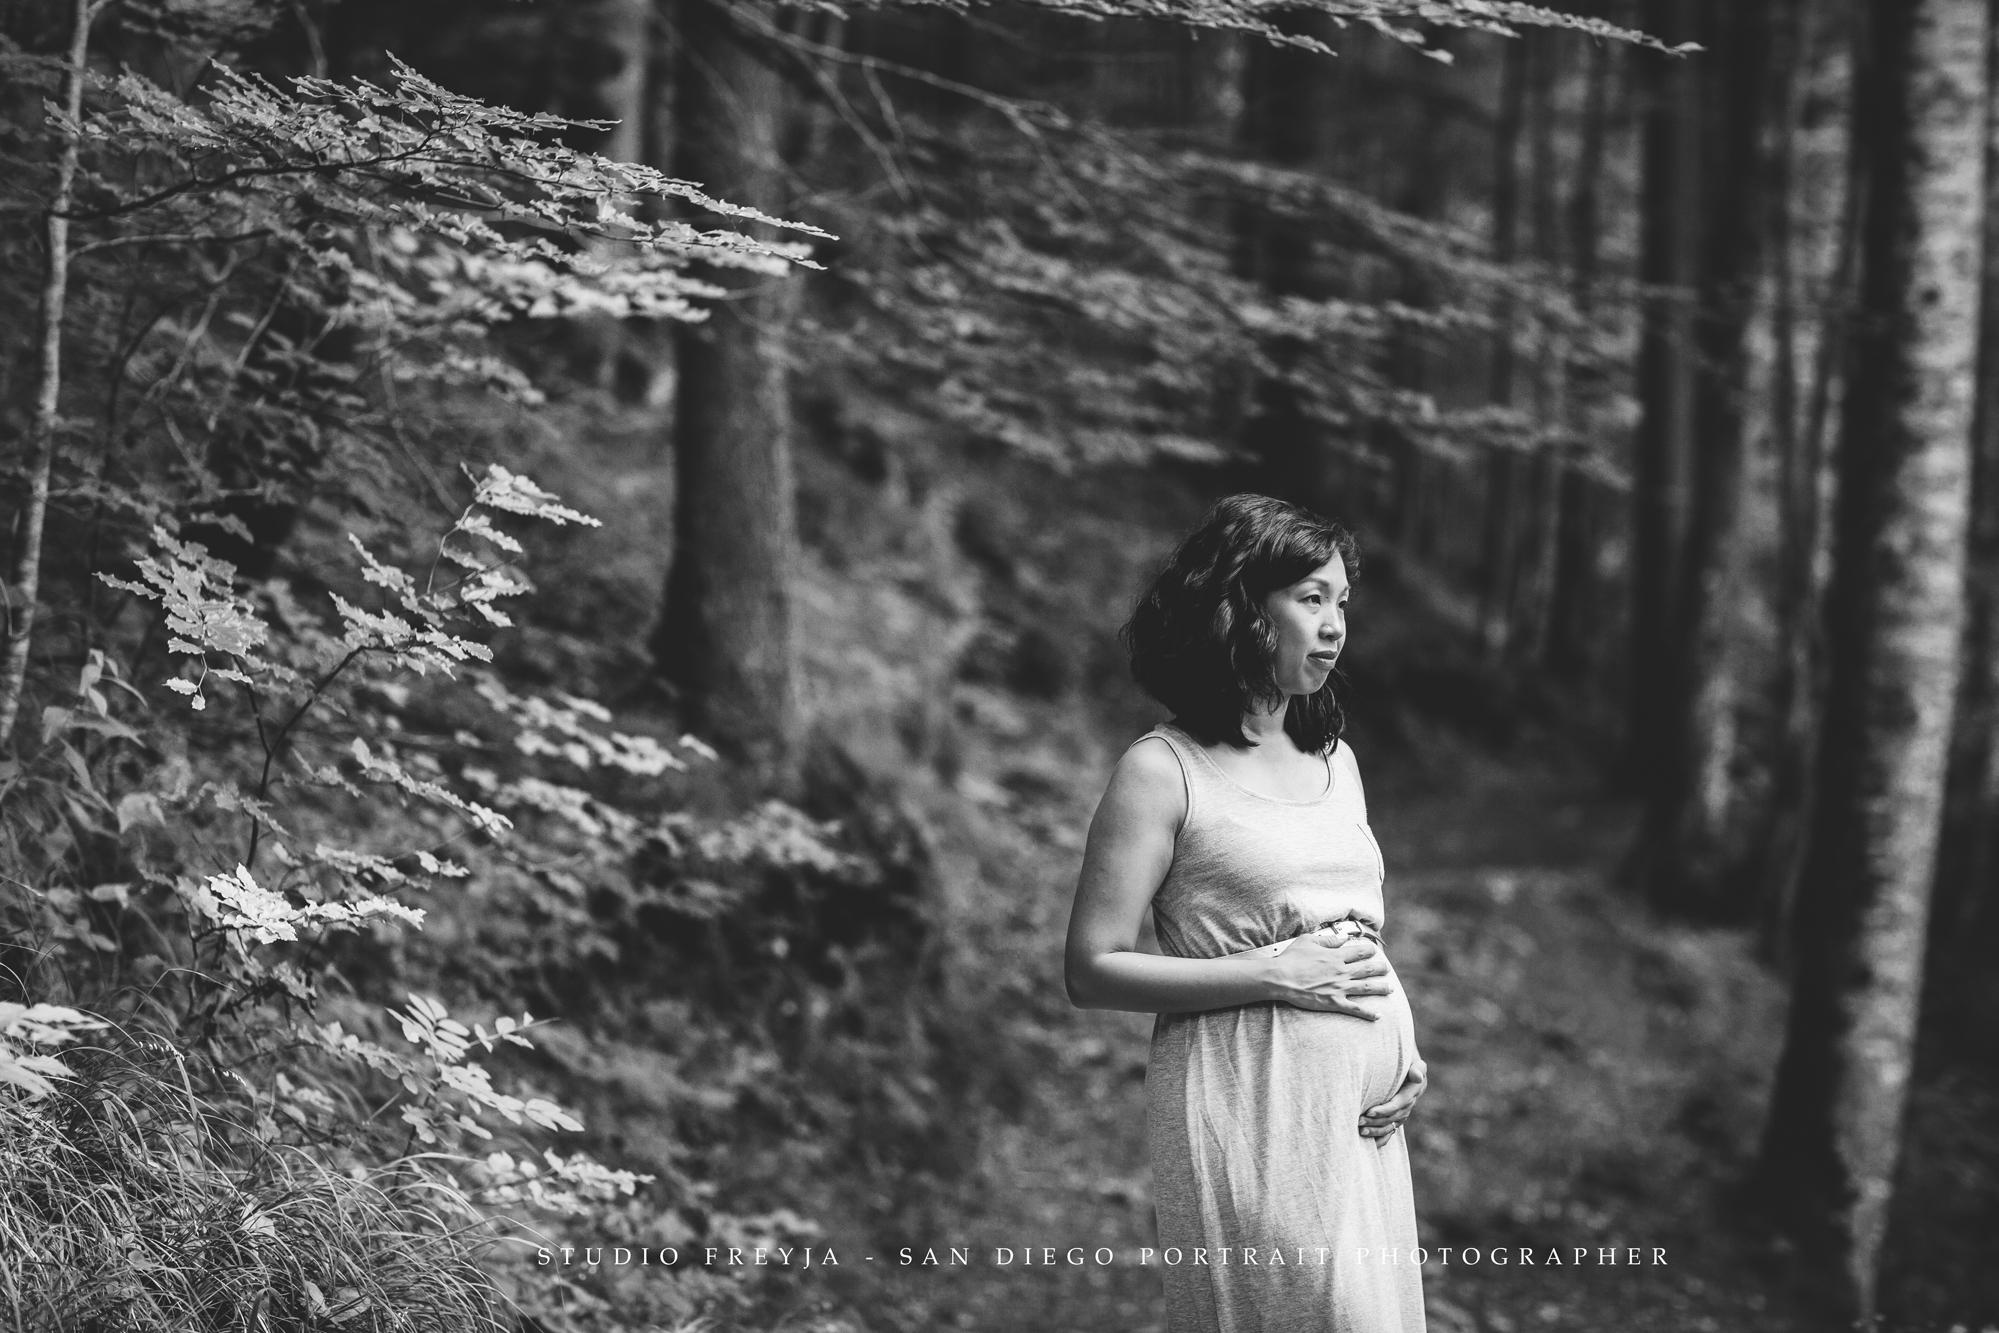 Germany Maternity Photography by San Diego Maternity Photographer Studio Freyja 5.jpg